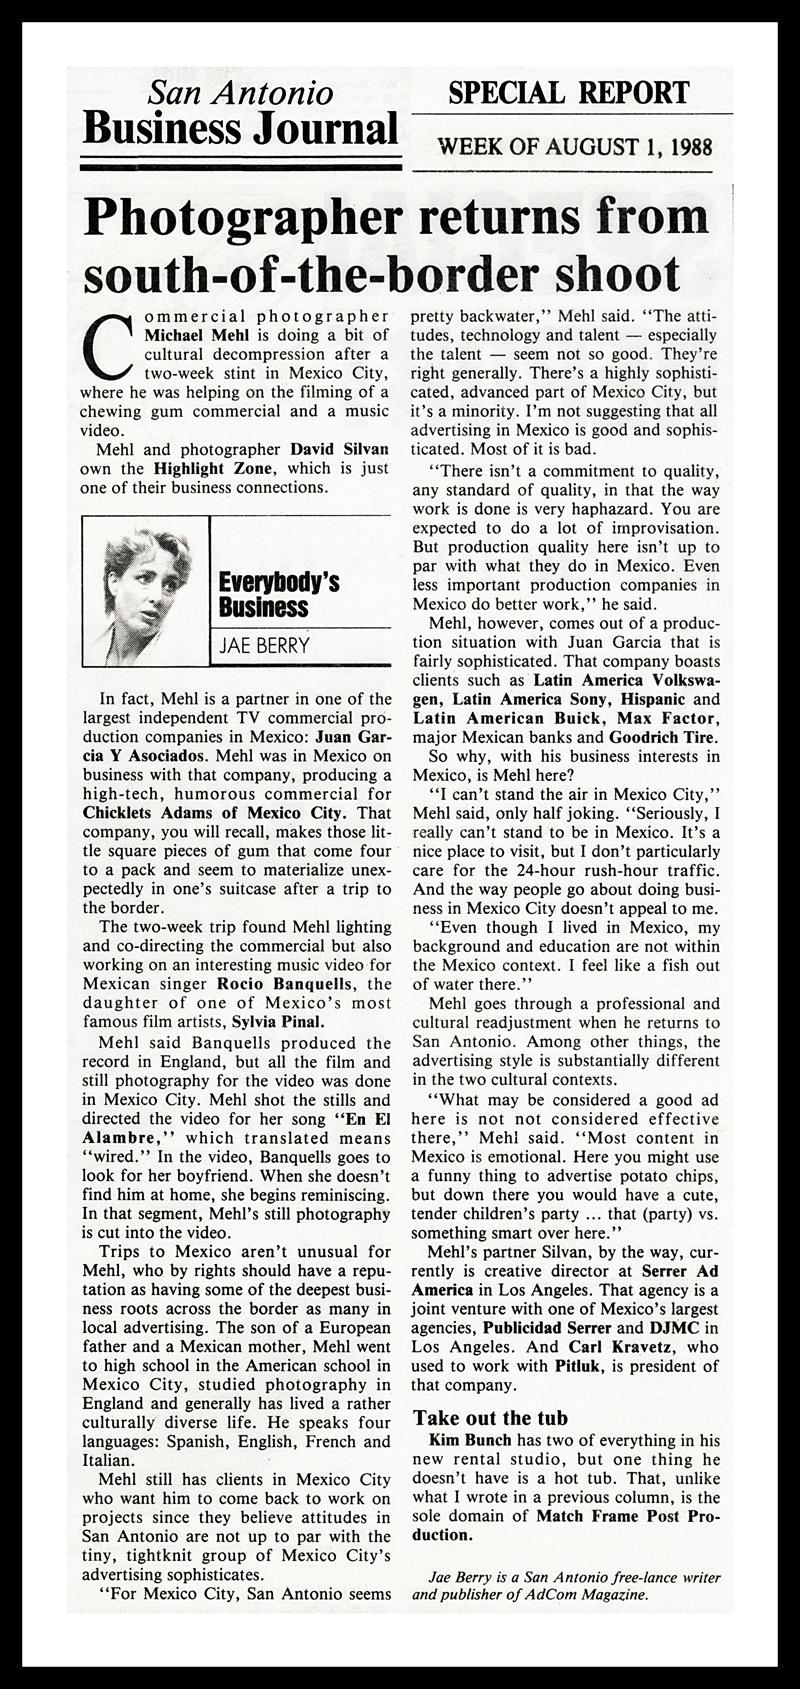 1988_Michael-Mehl_San-Antonio-Business-Journal_Jae-Berry_Everybody's-Business